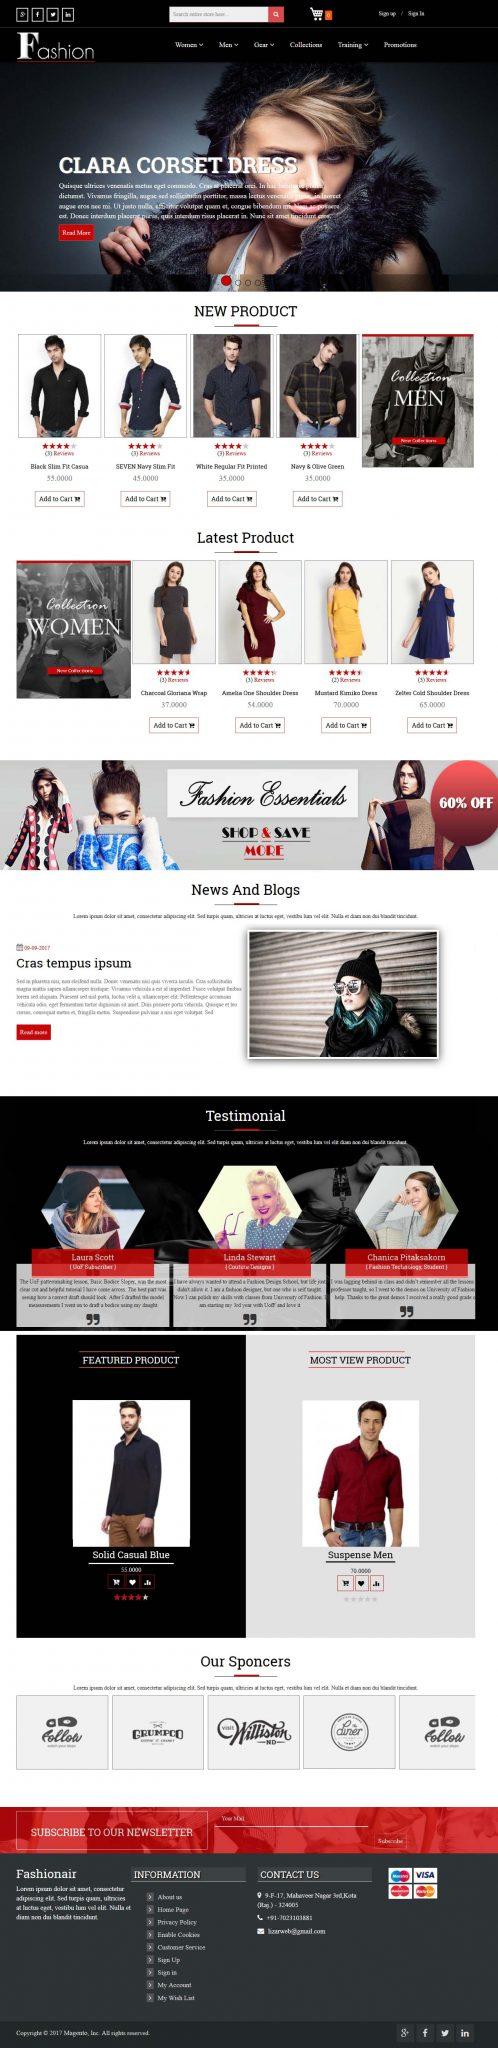 screenshot of premium fashion theme on magento